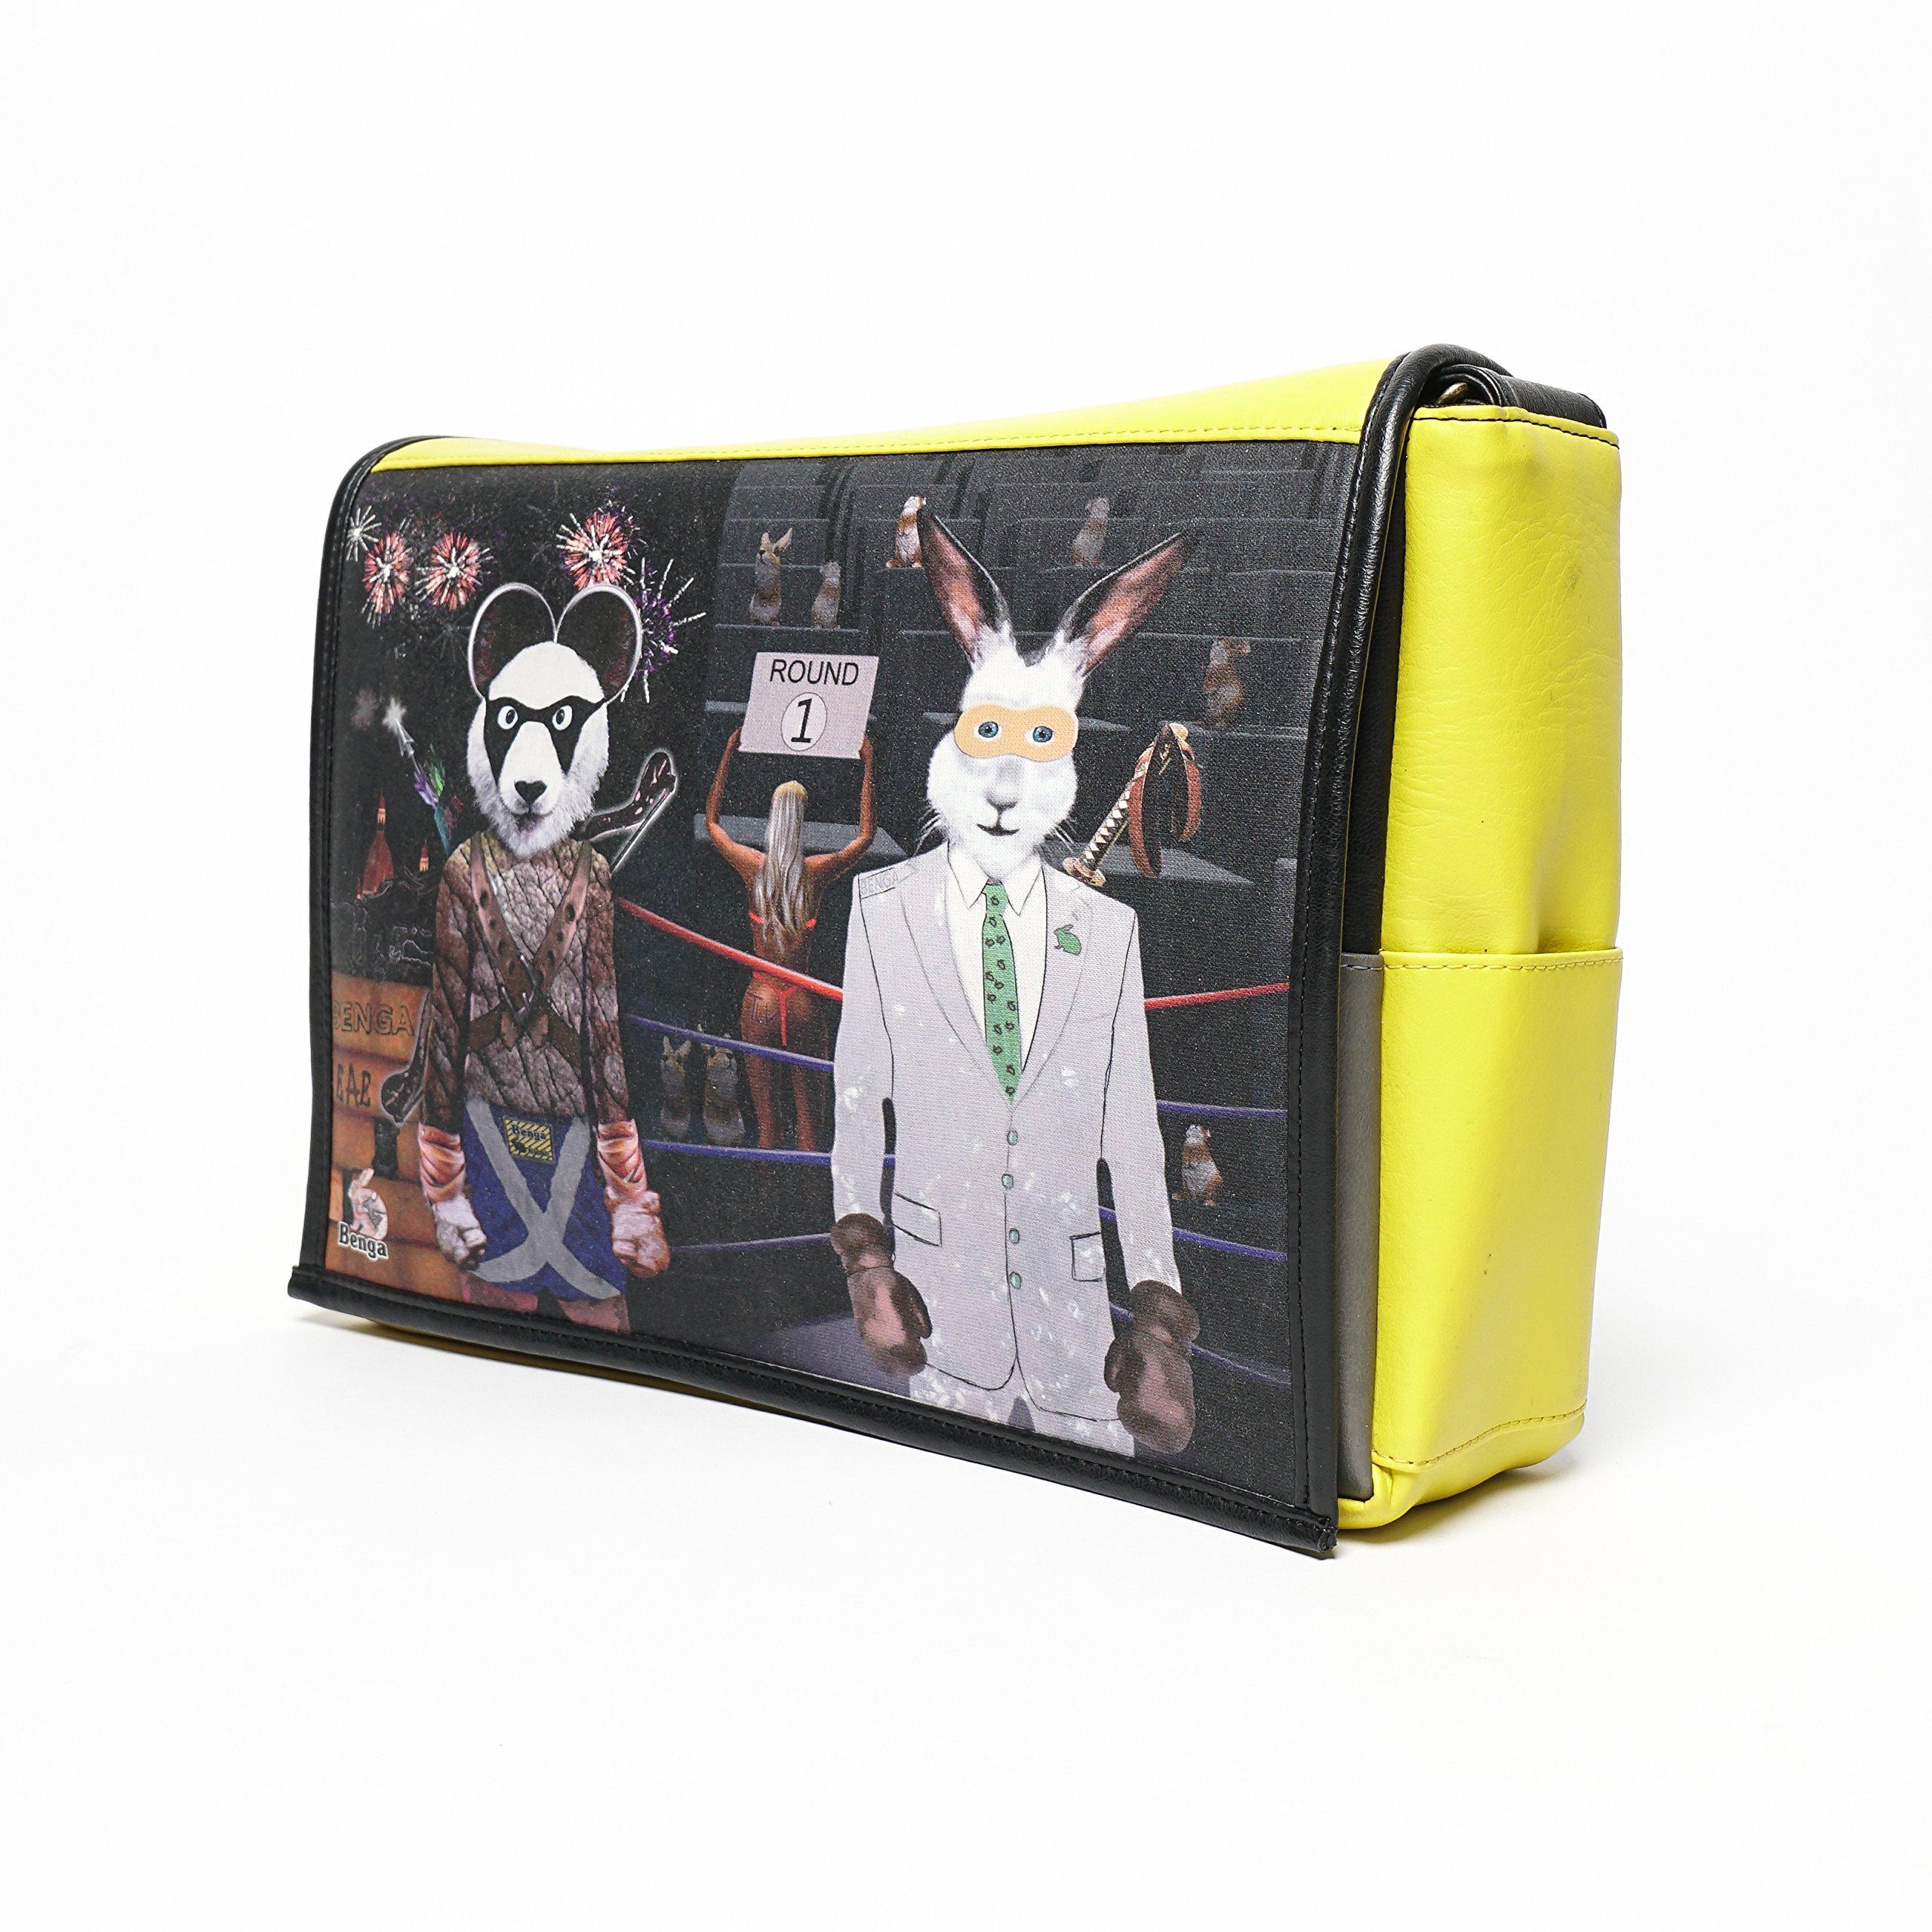 Student - Panda Vs Rabbit Print - Benga Rabbit - Yellow Vegan Leather Messenger Bag - Special Addition